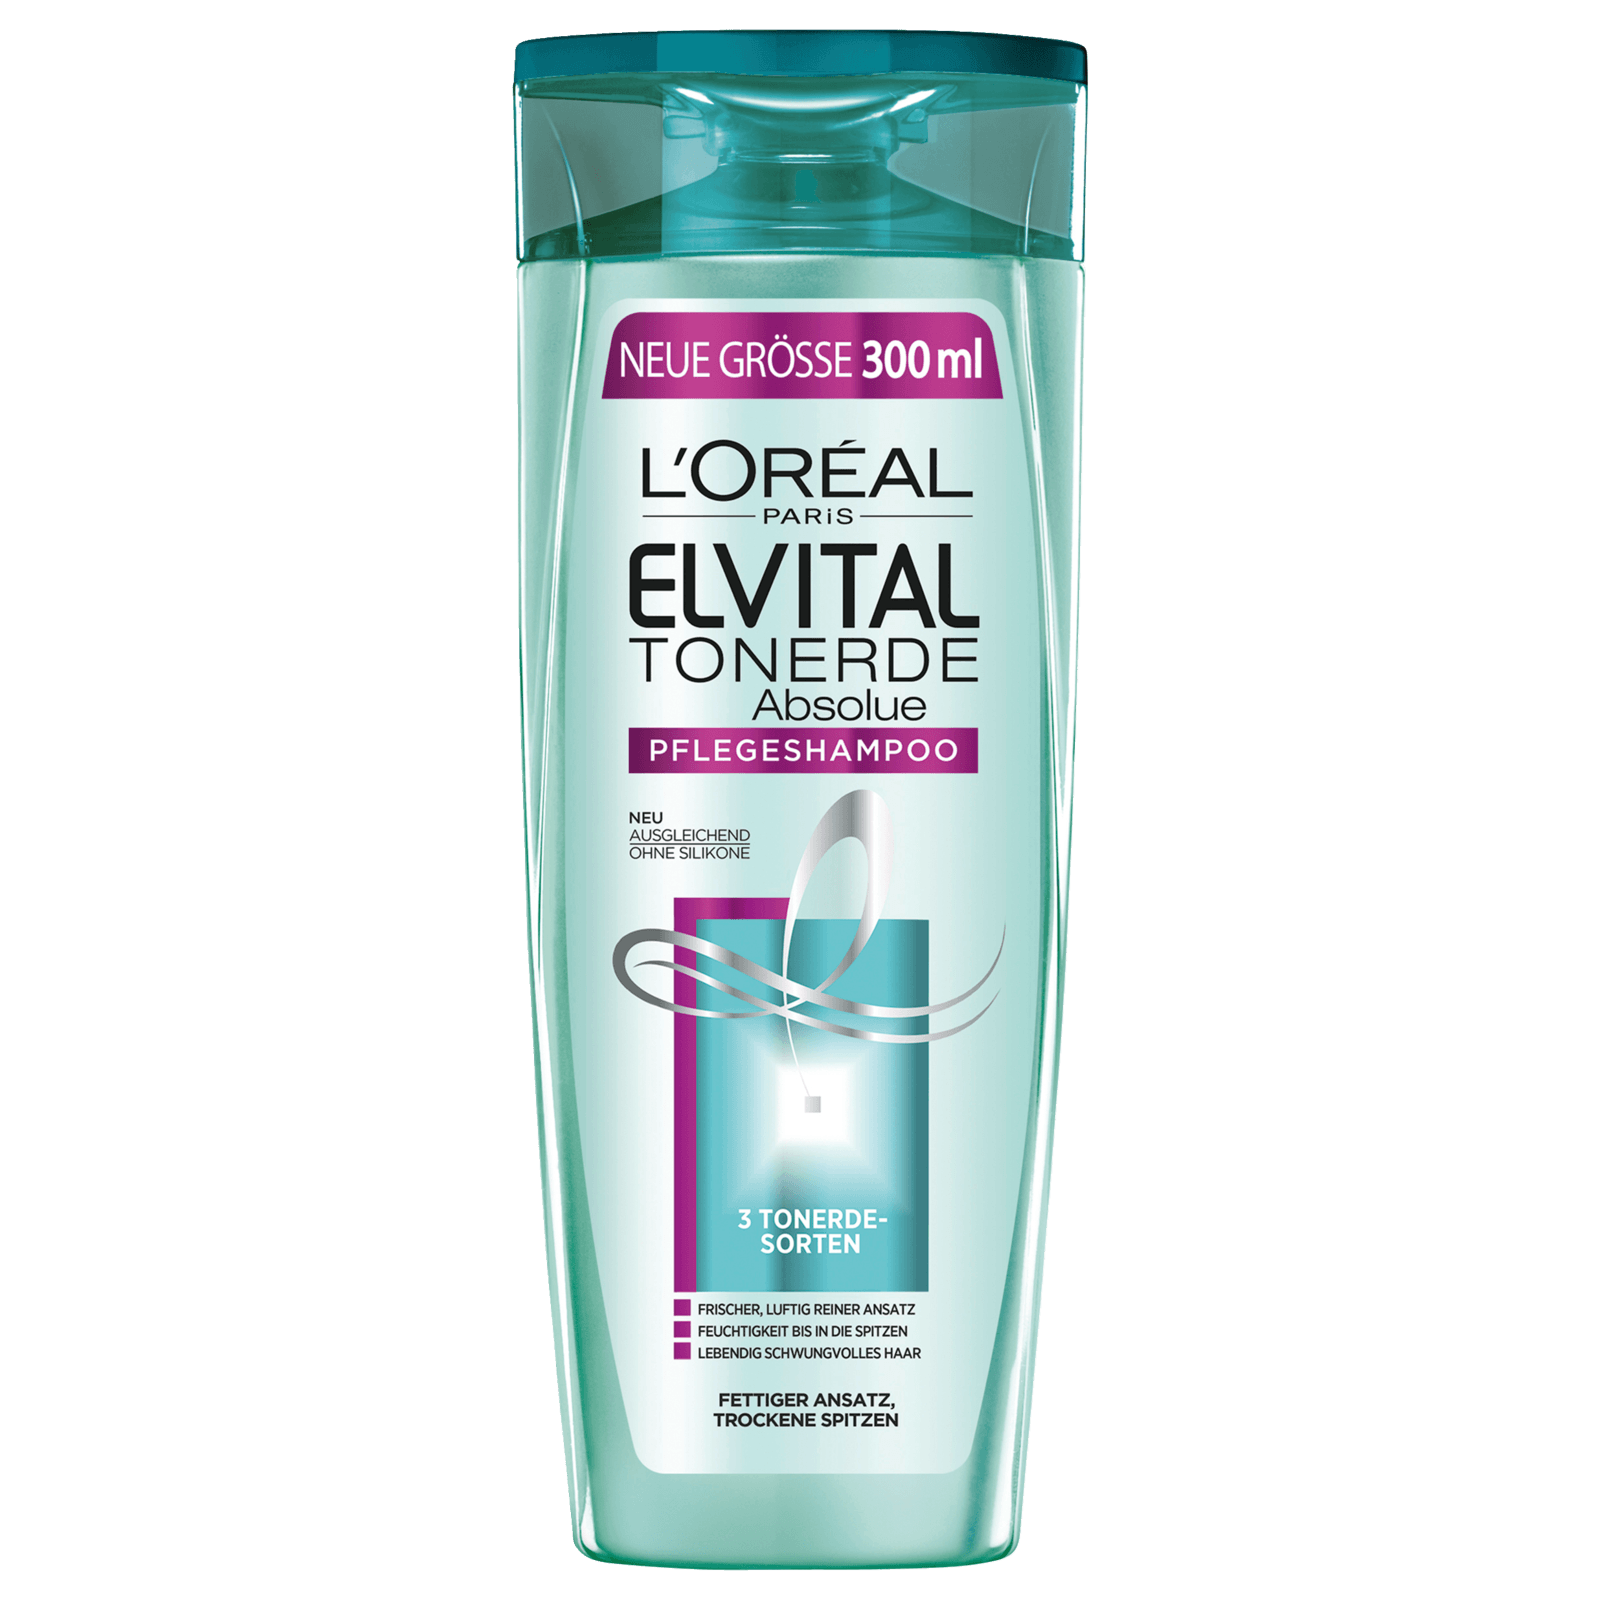 L'Oréal Paris Elvital Shampoo Tonerde 300ml